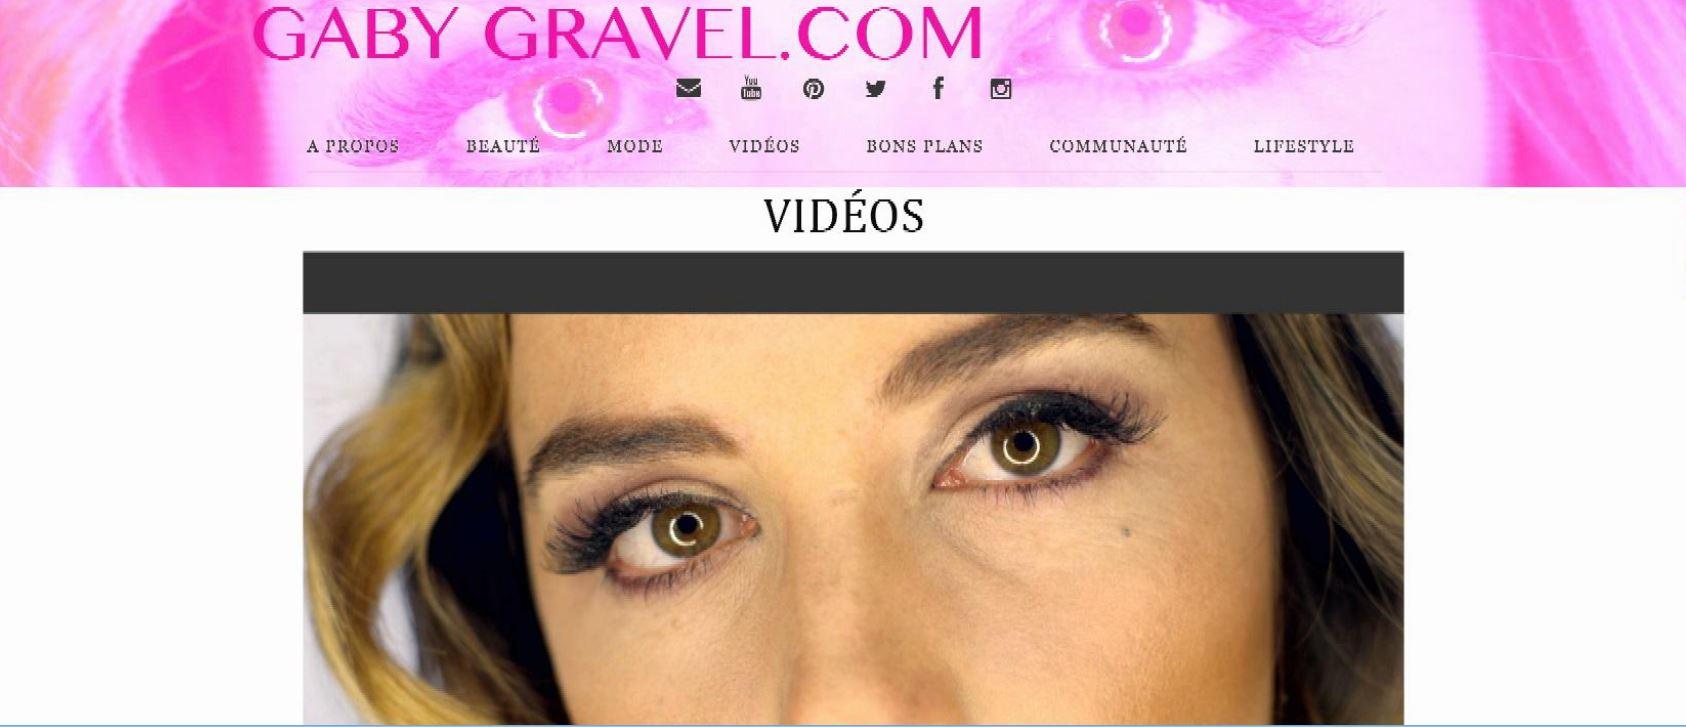 Gaby Gravel